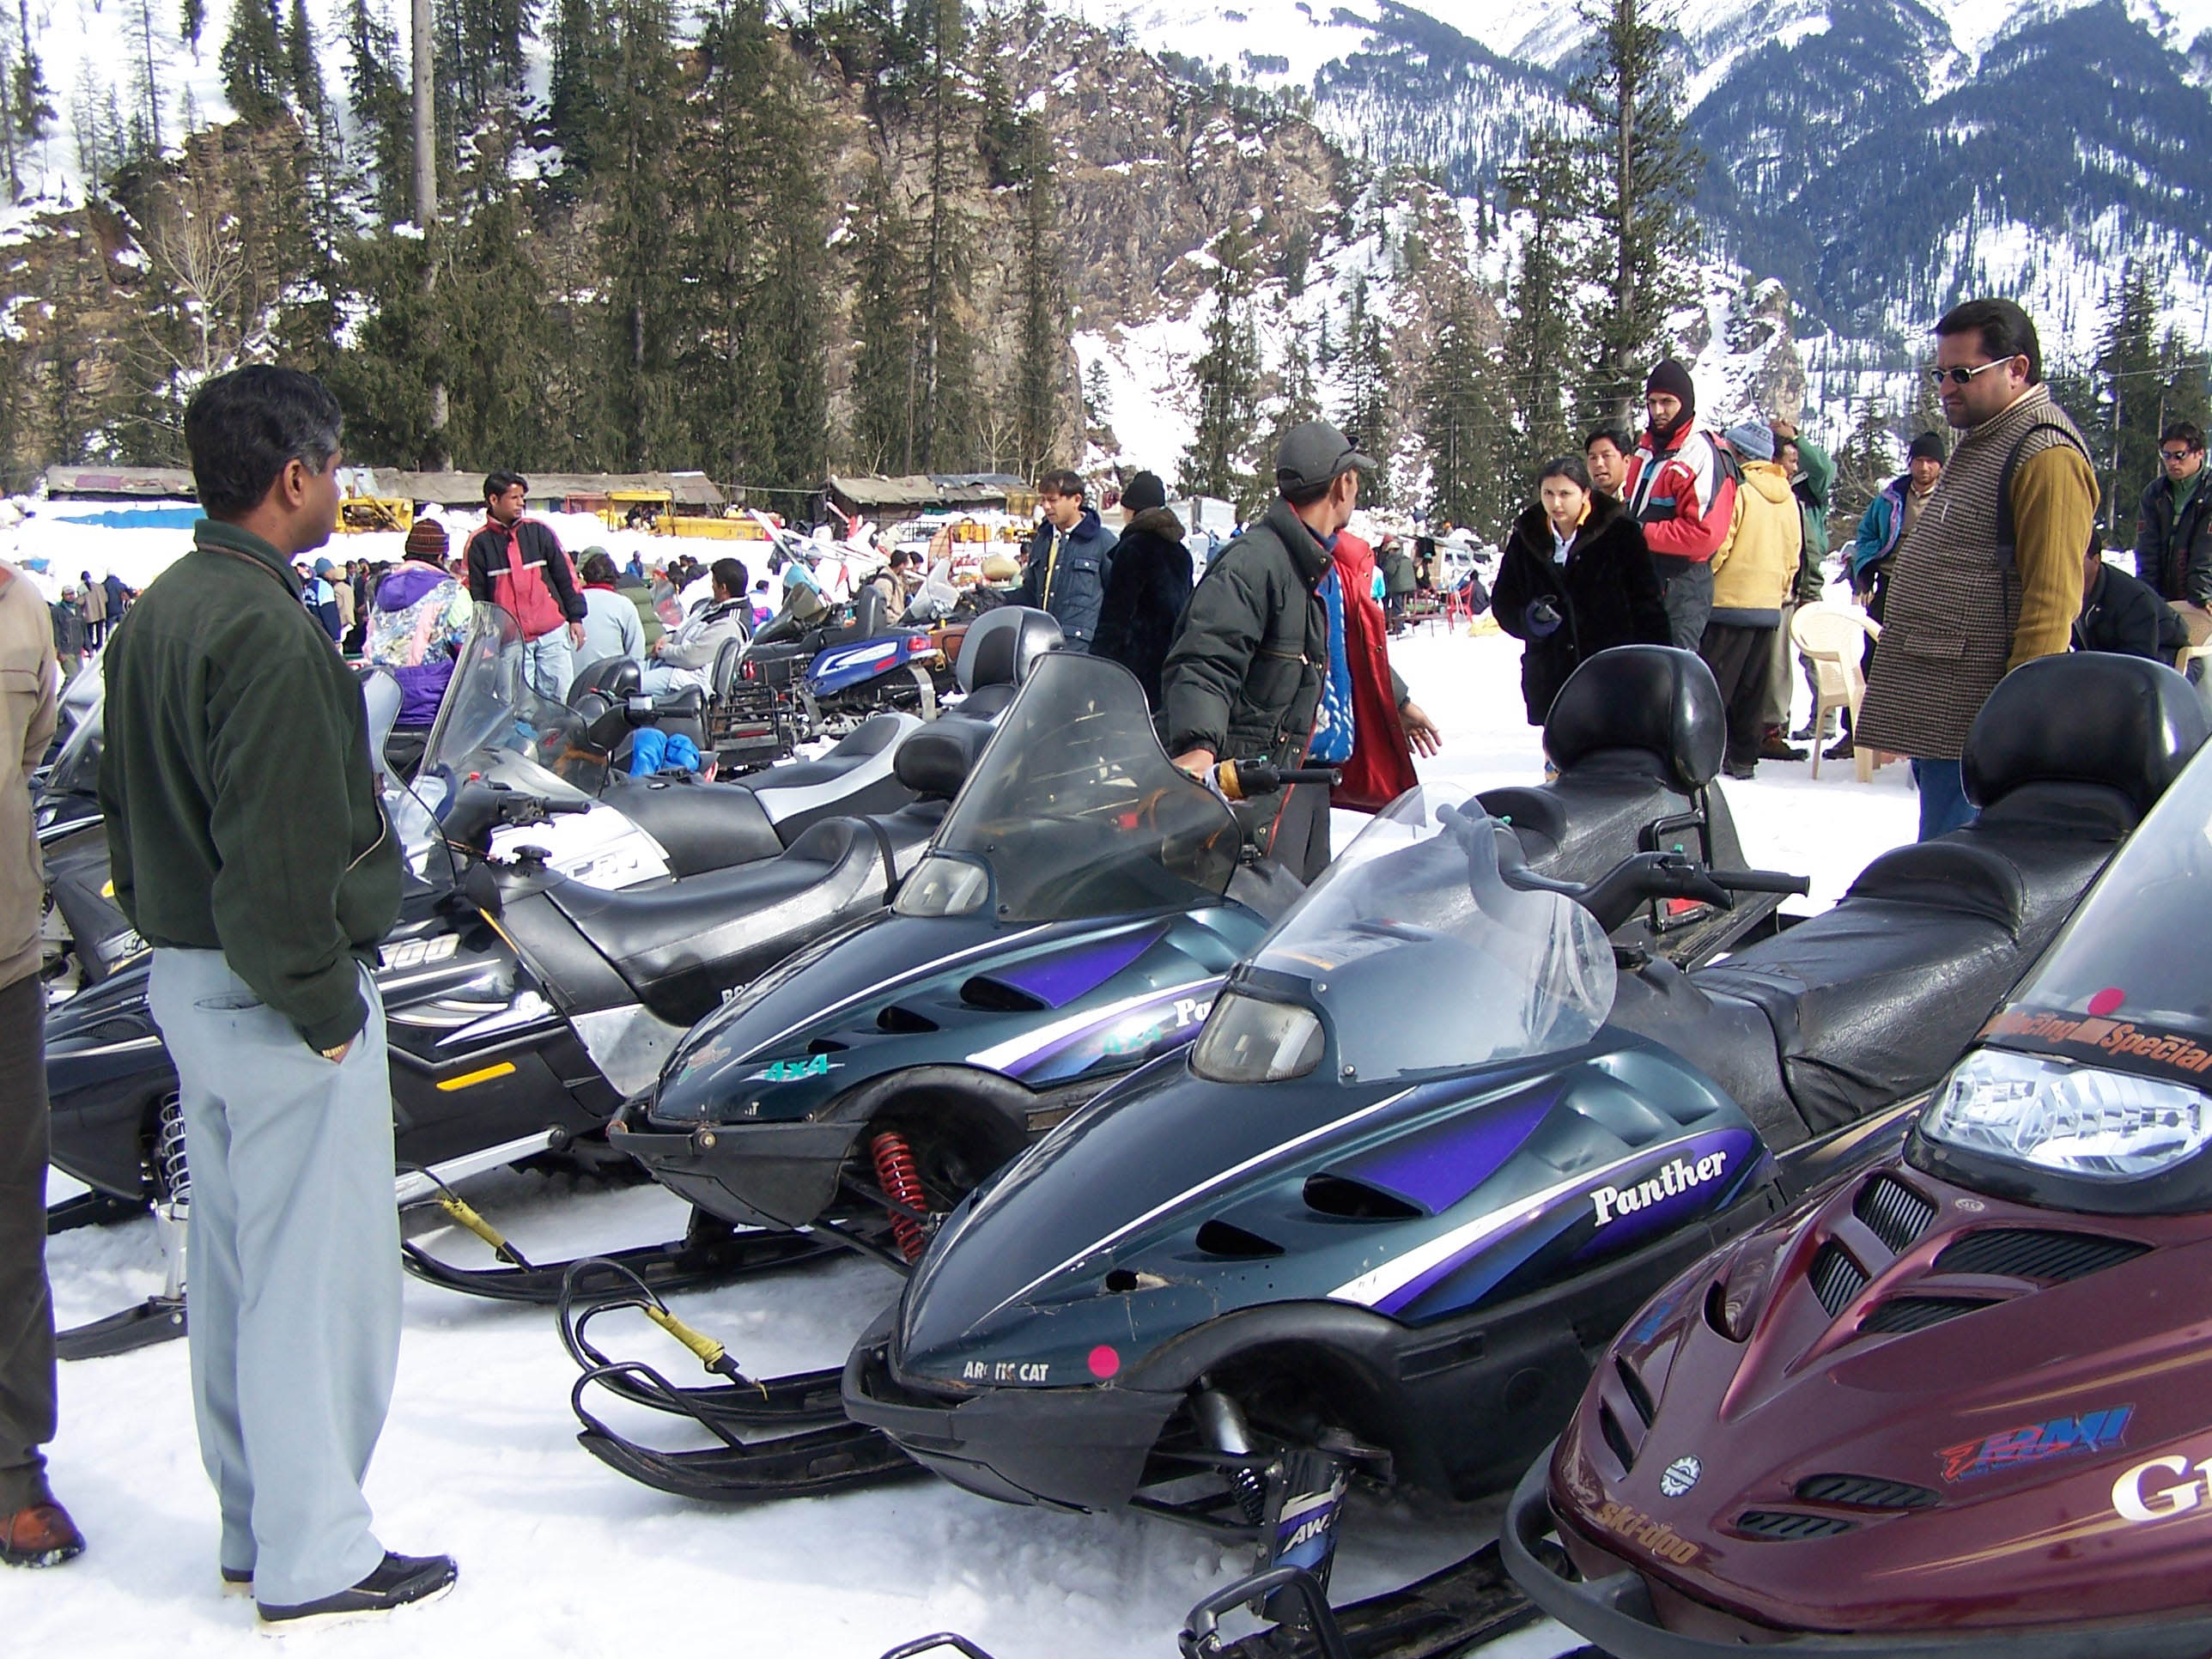 snow-scooter-solang-nala-manali-2.jpg